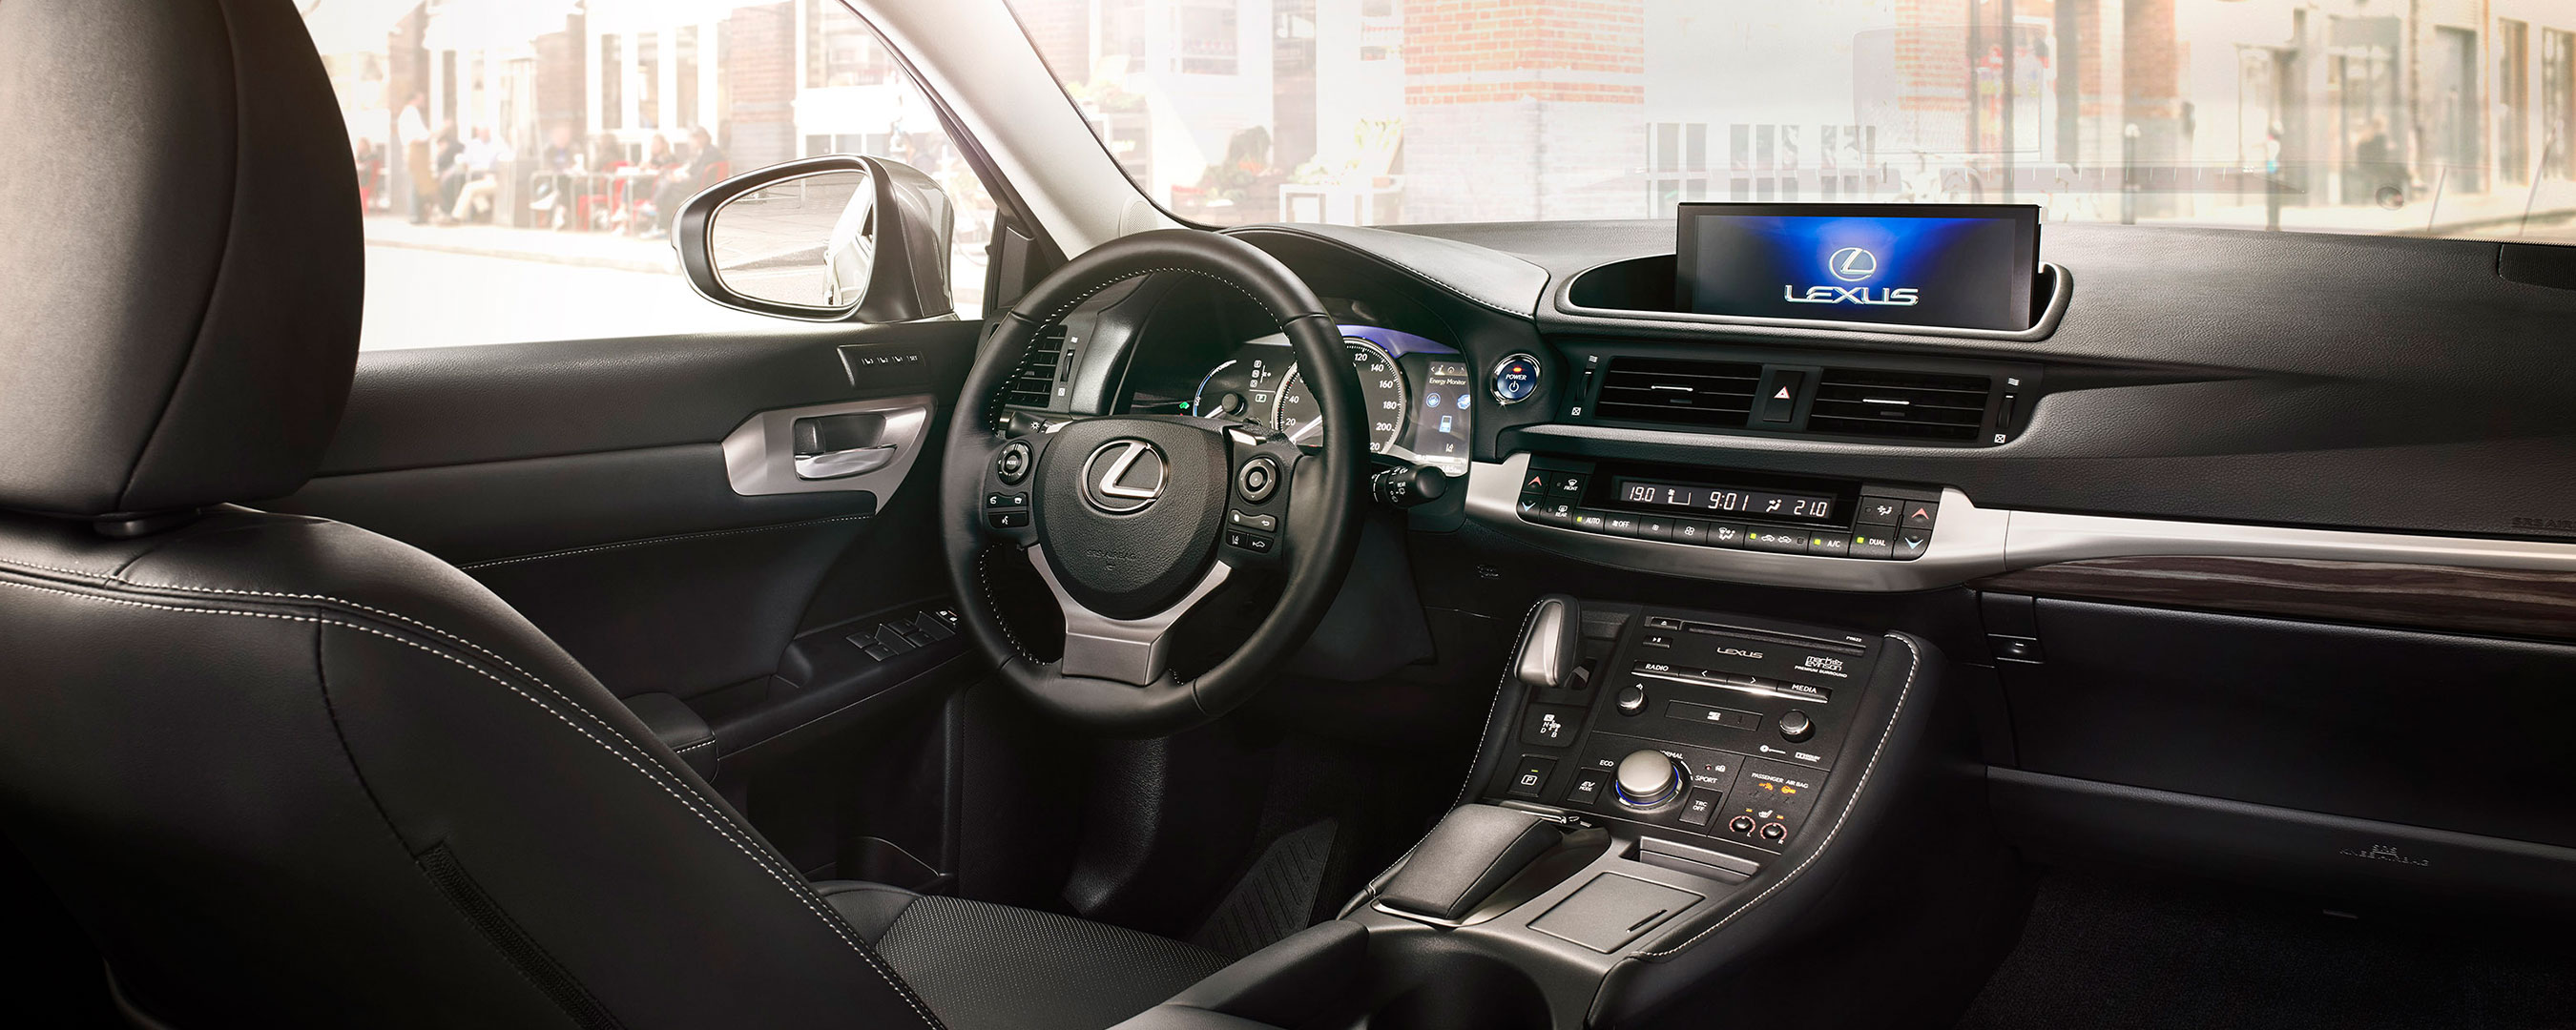 2017 Lexus CT – Luxury Hybrid | Lexus.com